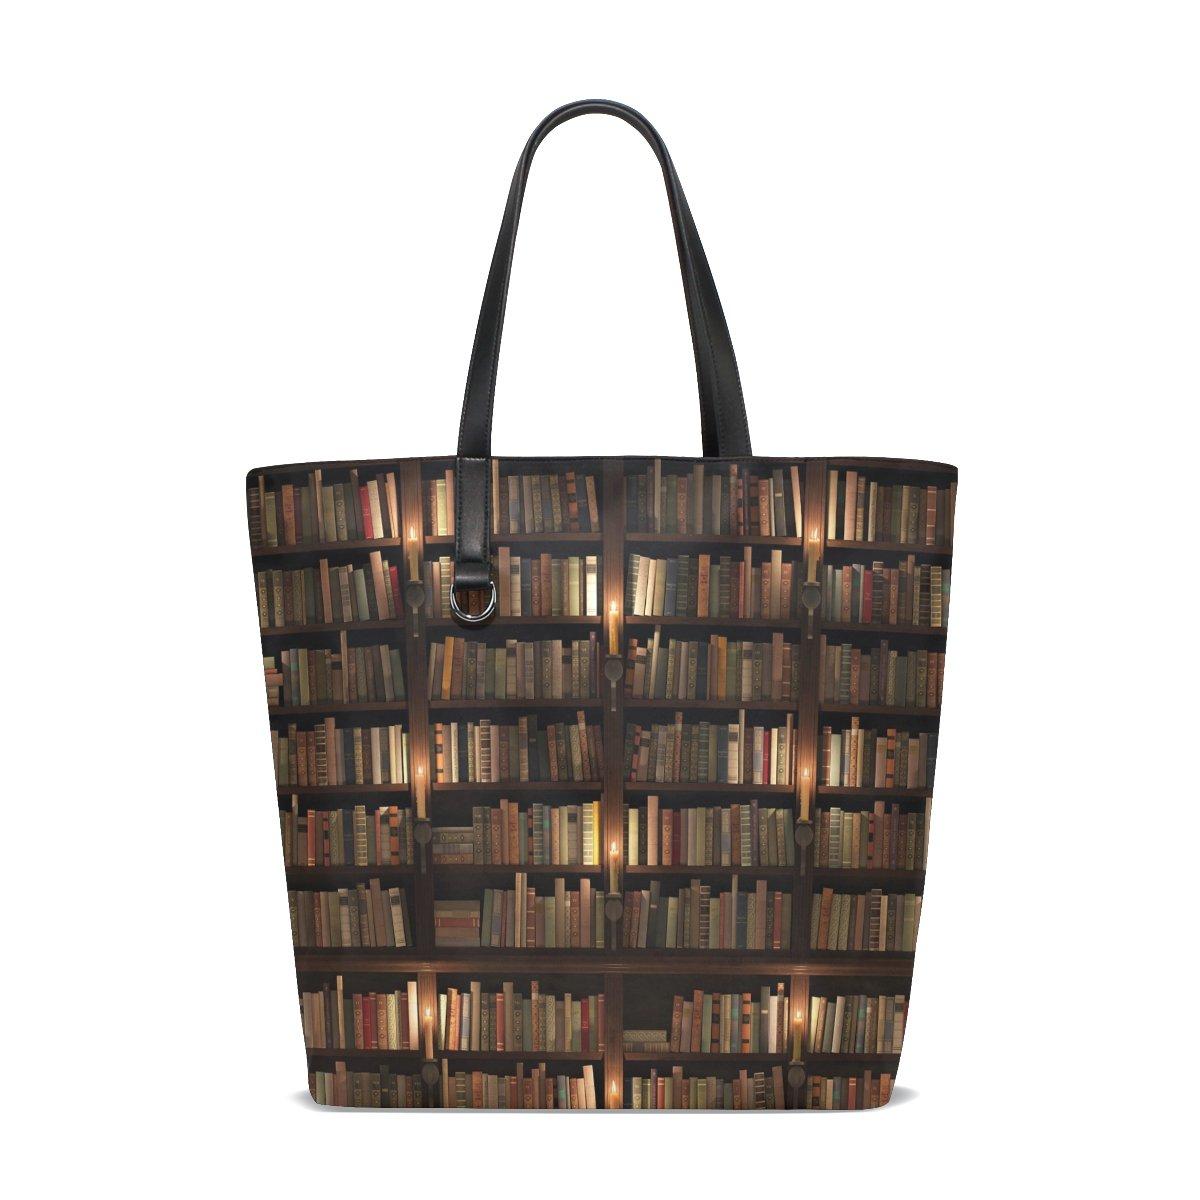 ALAZA Funny Dachshund Dog Black Tote Bag Purse Handbag for Women Girls g1243253p174c204s304